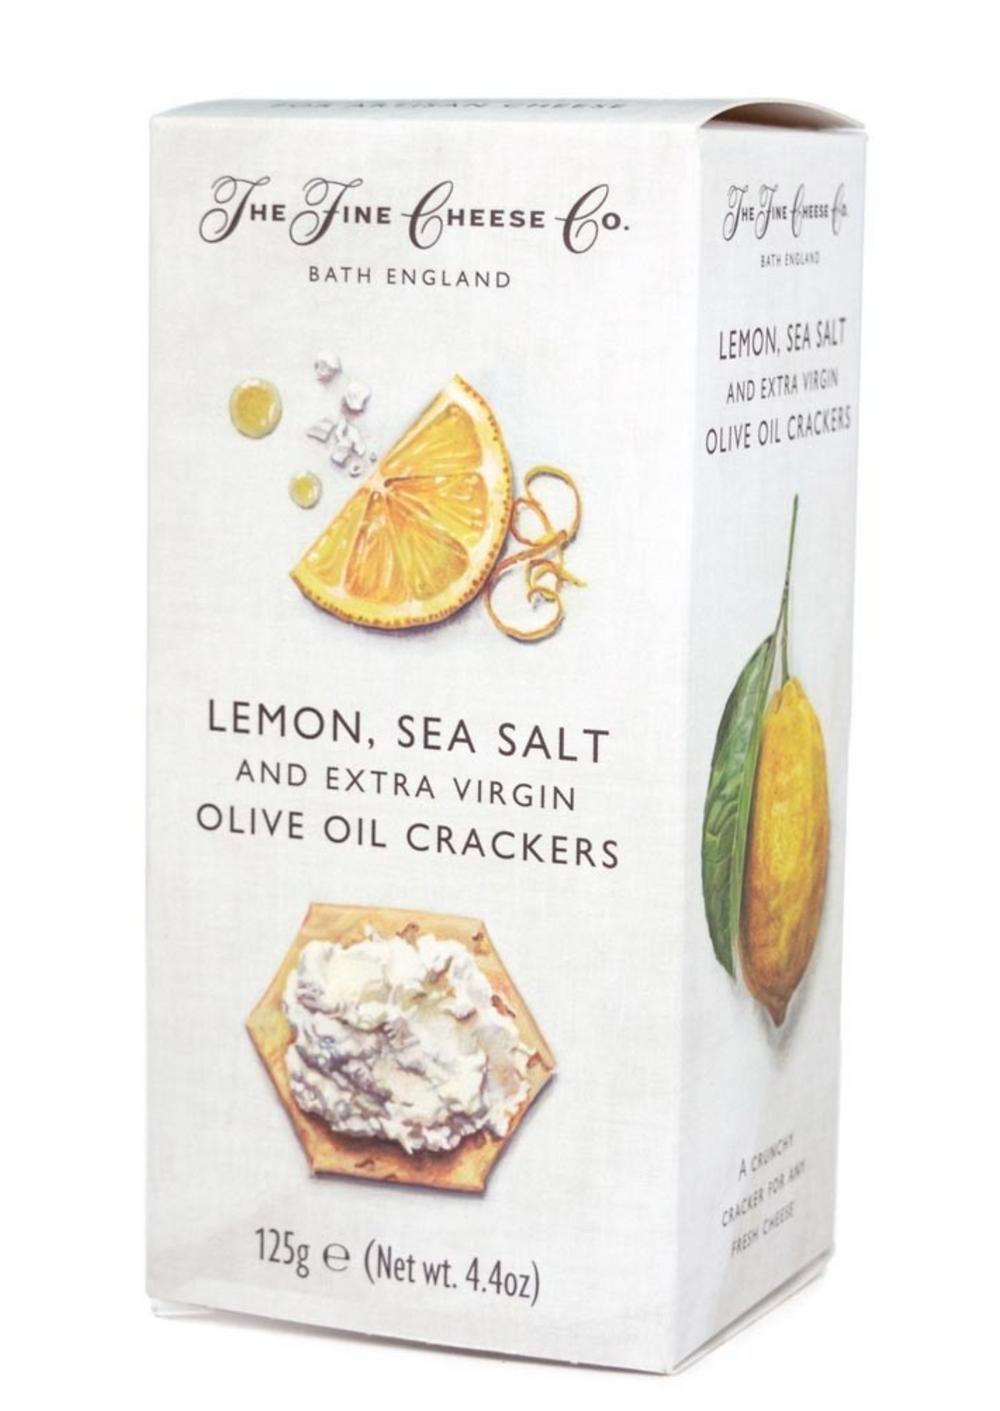 Lemon, Sea Salt and Extra Virgin Olive Oil Crackers